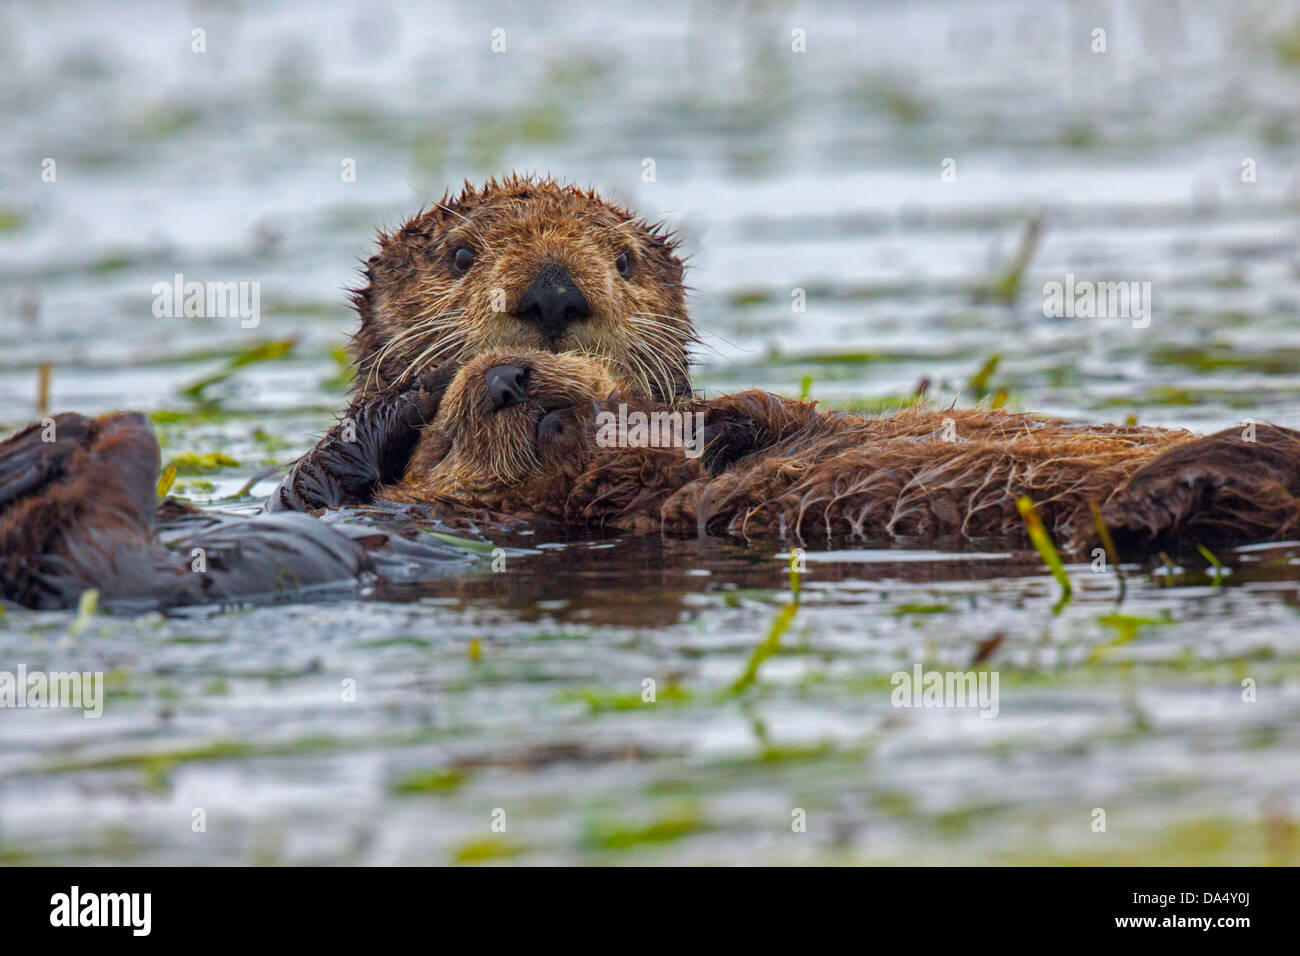 Loutre de mer (Enhydra lutris) Moss Landing, California, United States 24 juin AdultFemalw avec les jeunes. Mustélidés Photo Stock